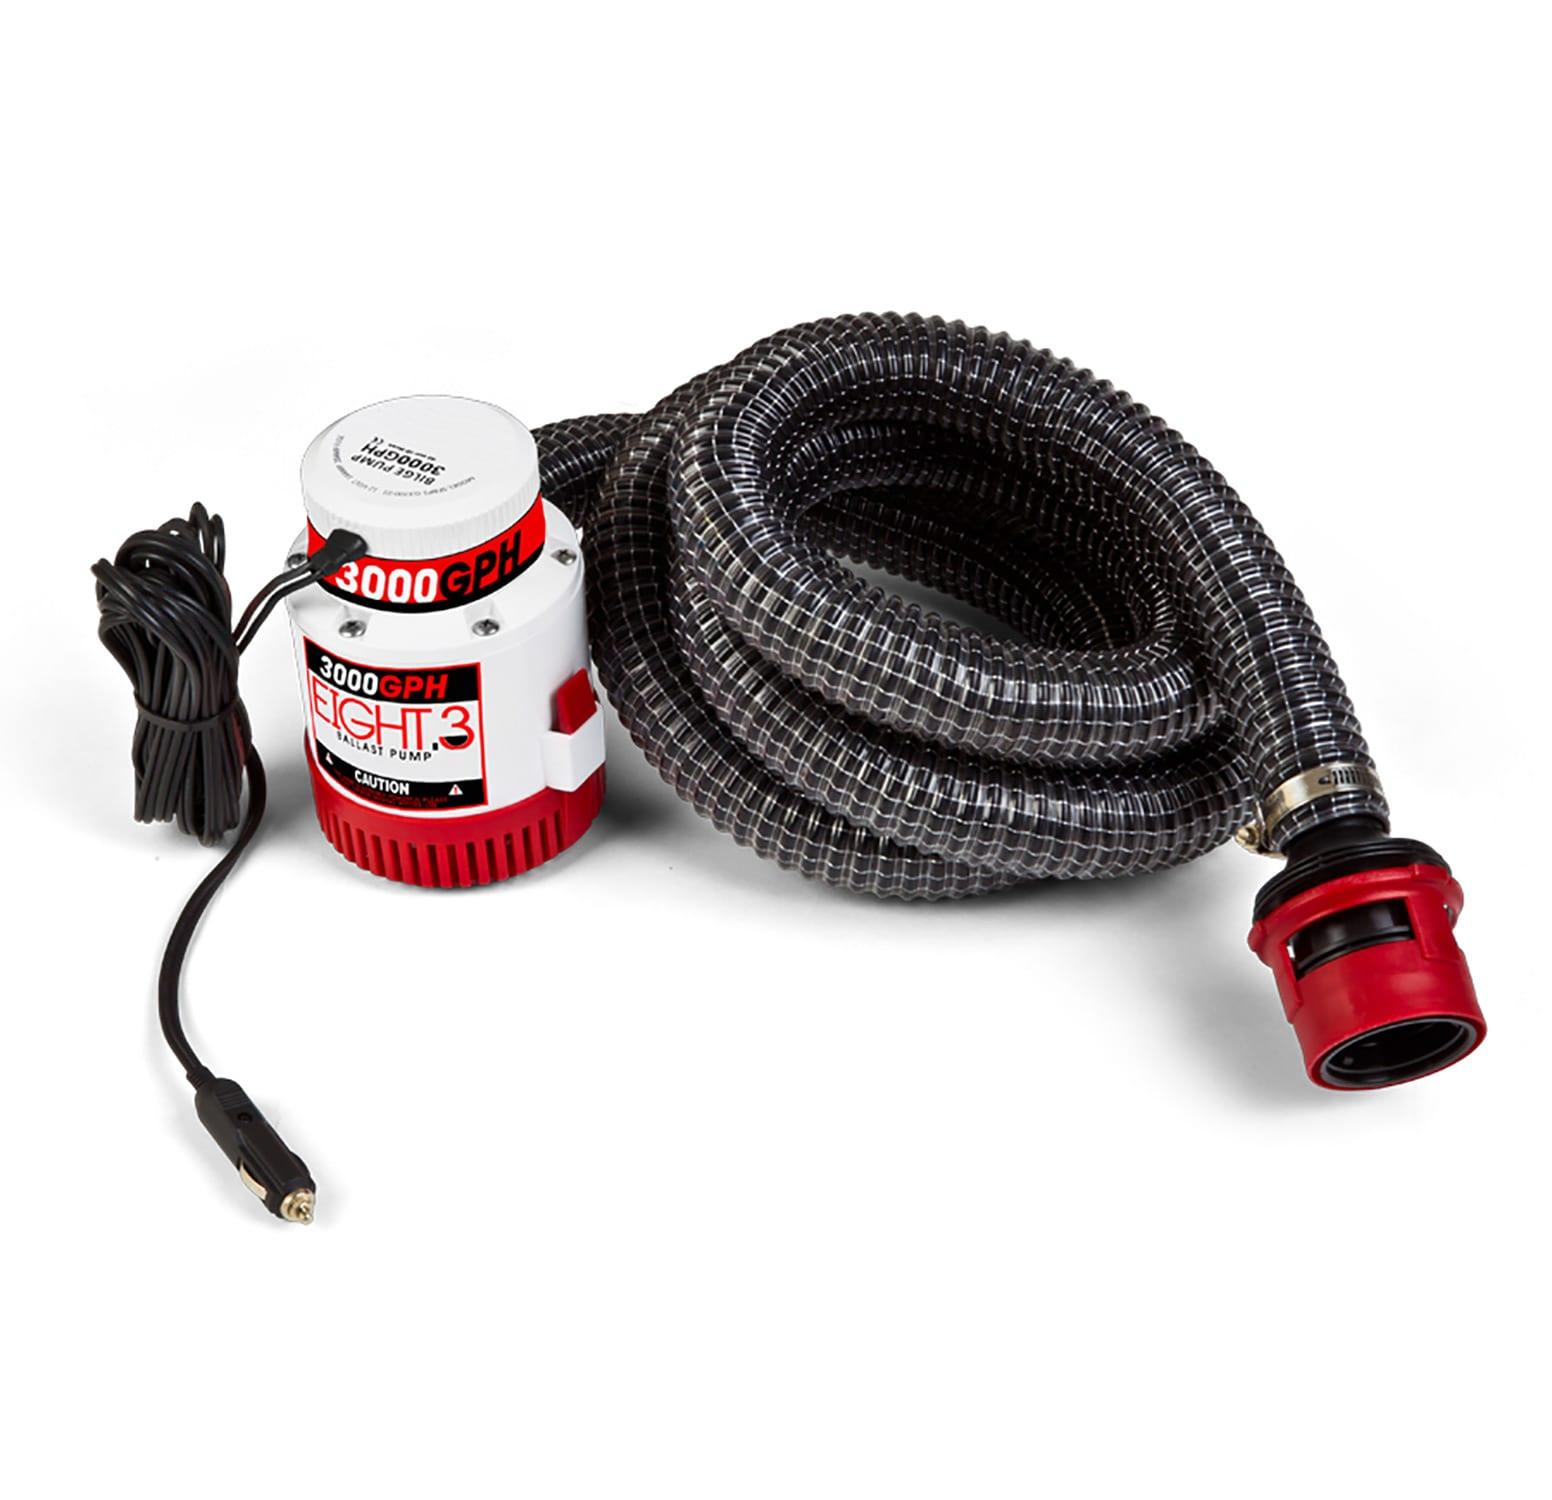 Image of Eight.3 Sub Pump 3000GPH 12V 12AMP Fuse Ballast Pump